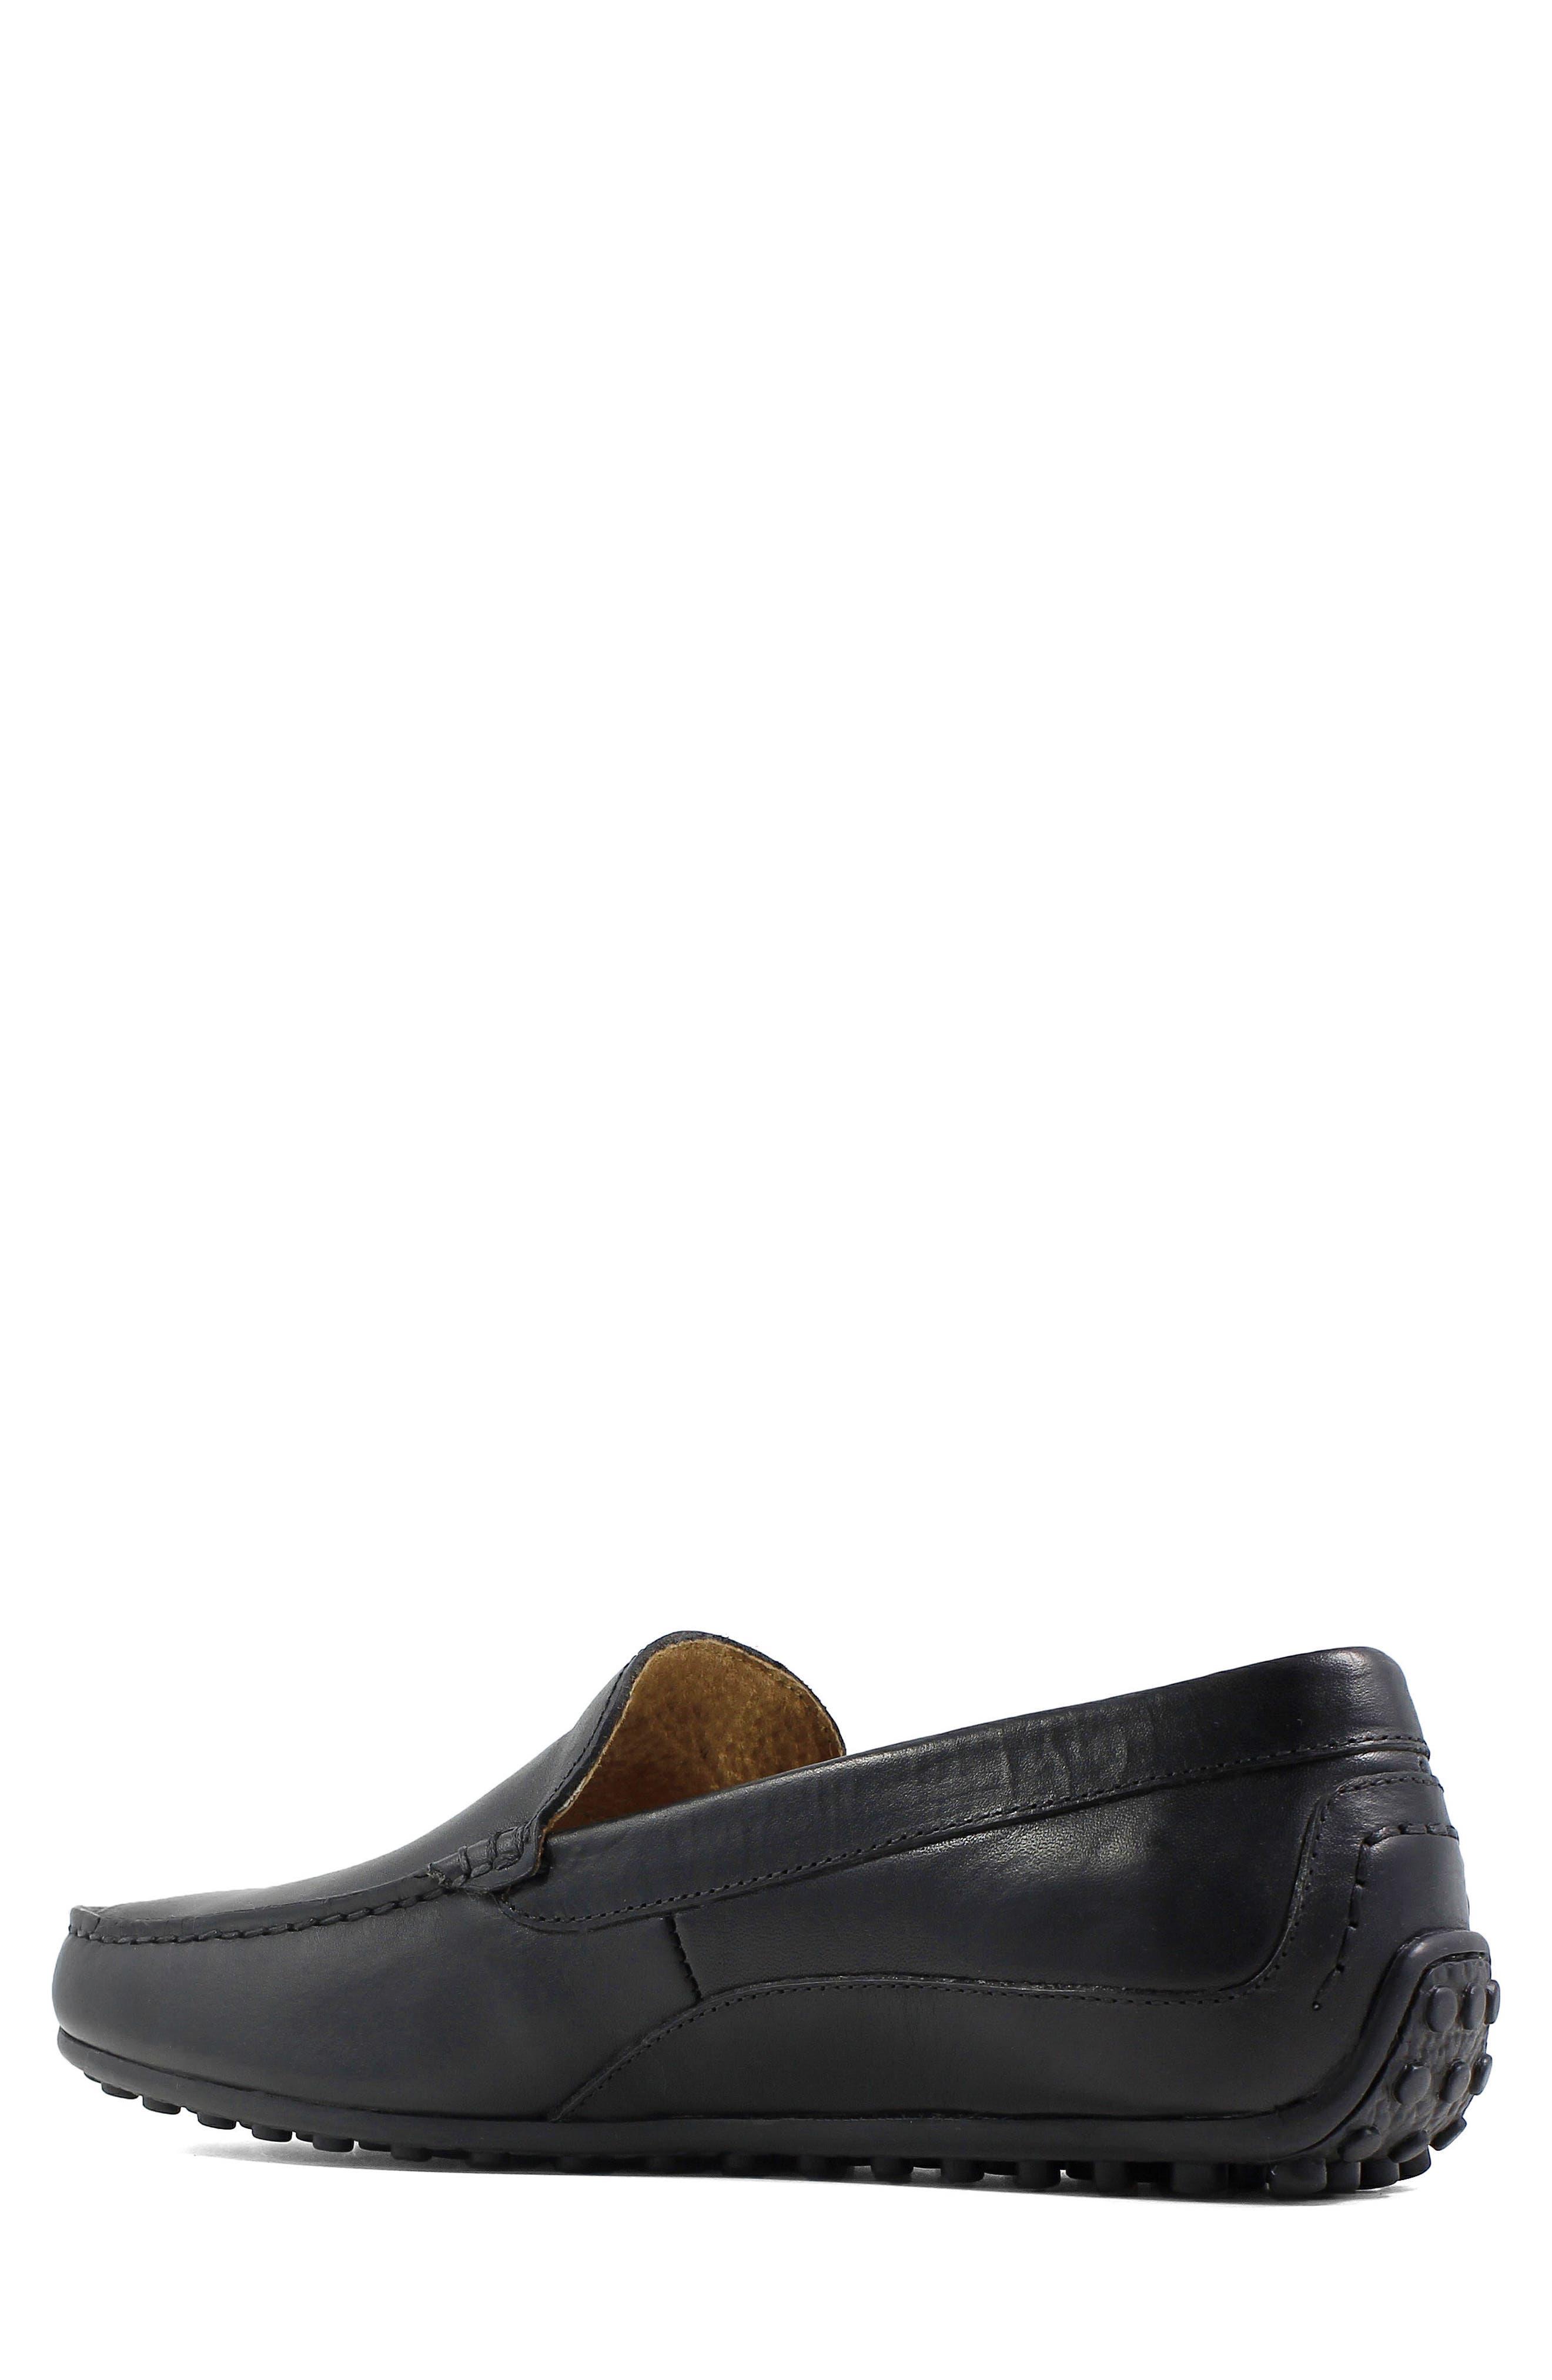 Oval Driving Shoe,                             Alternate thumbnail 2, color,                             BLACK LEATHER